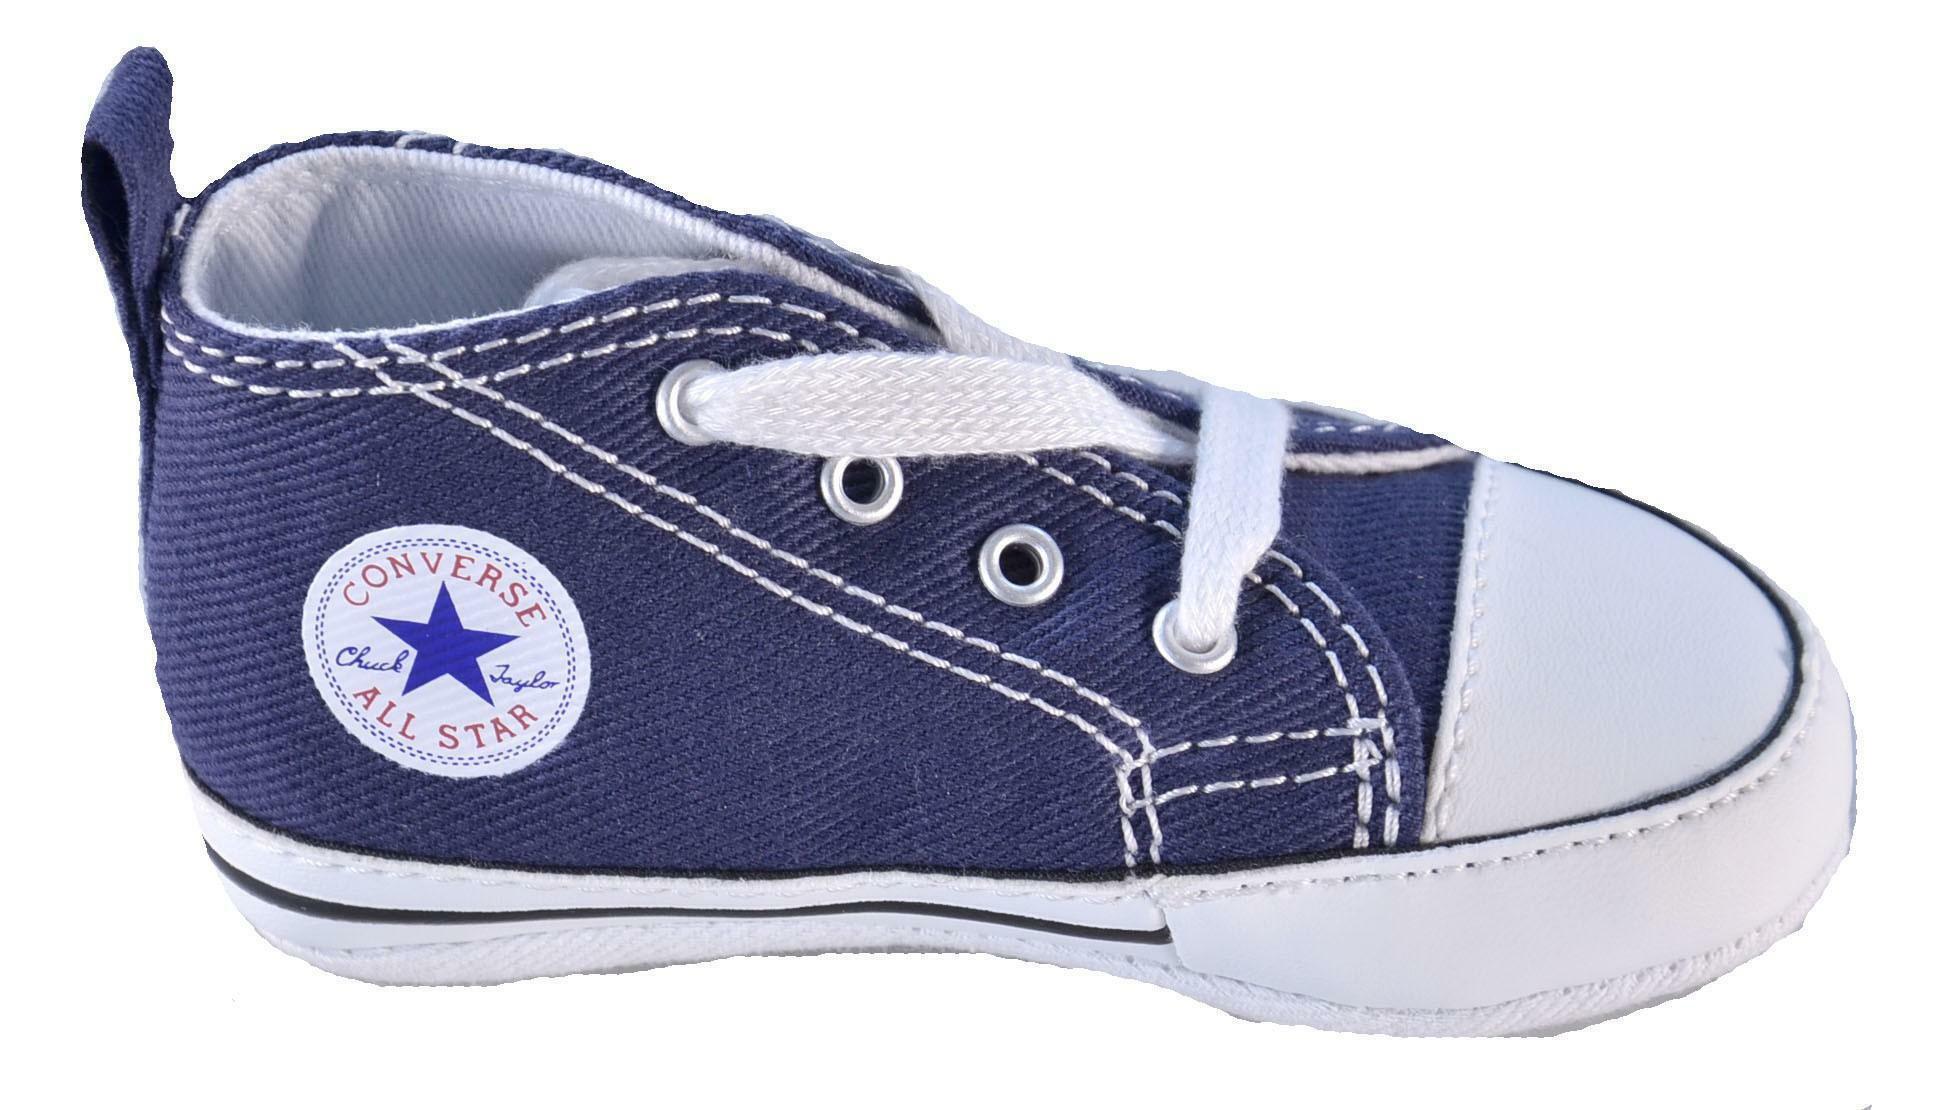 converse converse all star blu first star tela lacci 88865